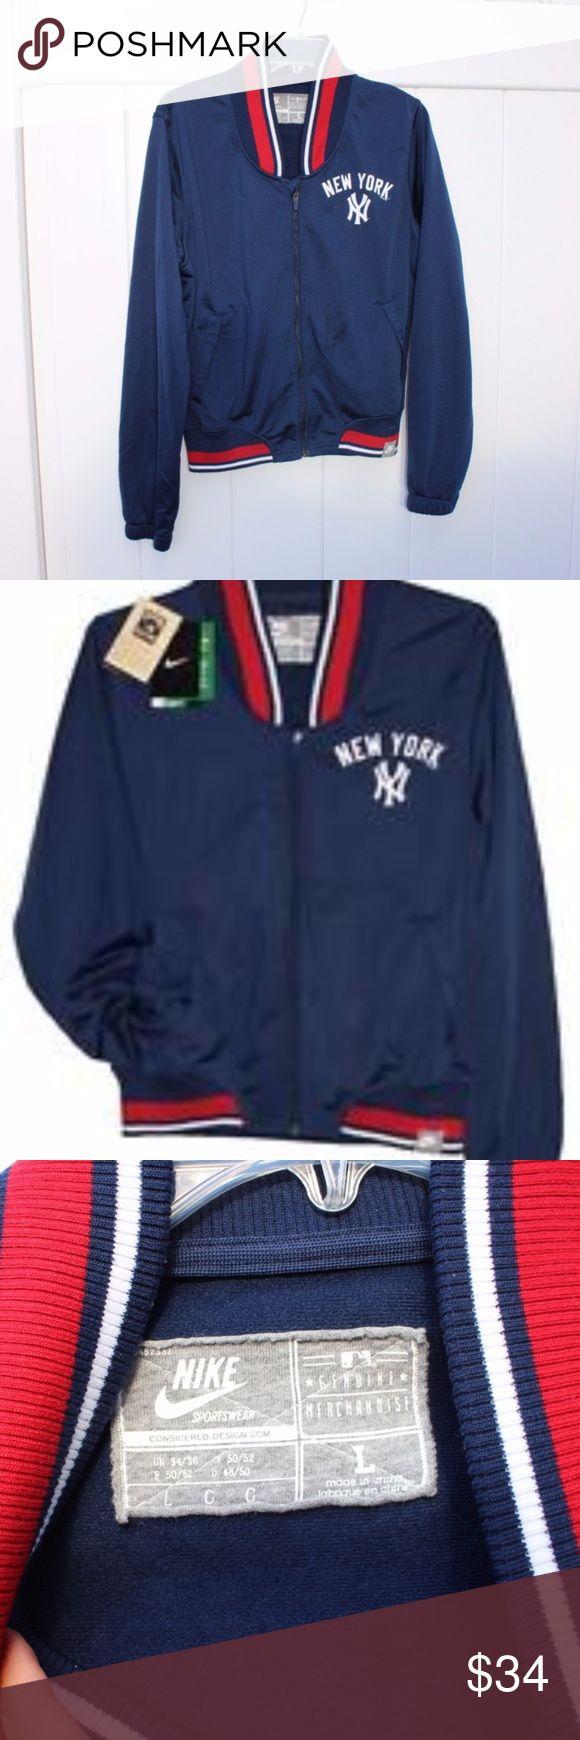 new york yankees 31 pedro feliciano white jersey e05100b58c8